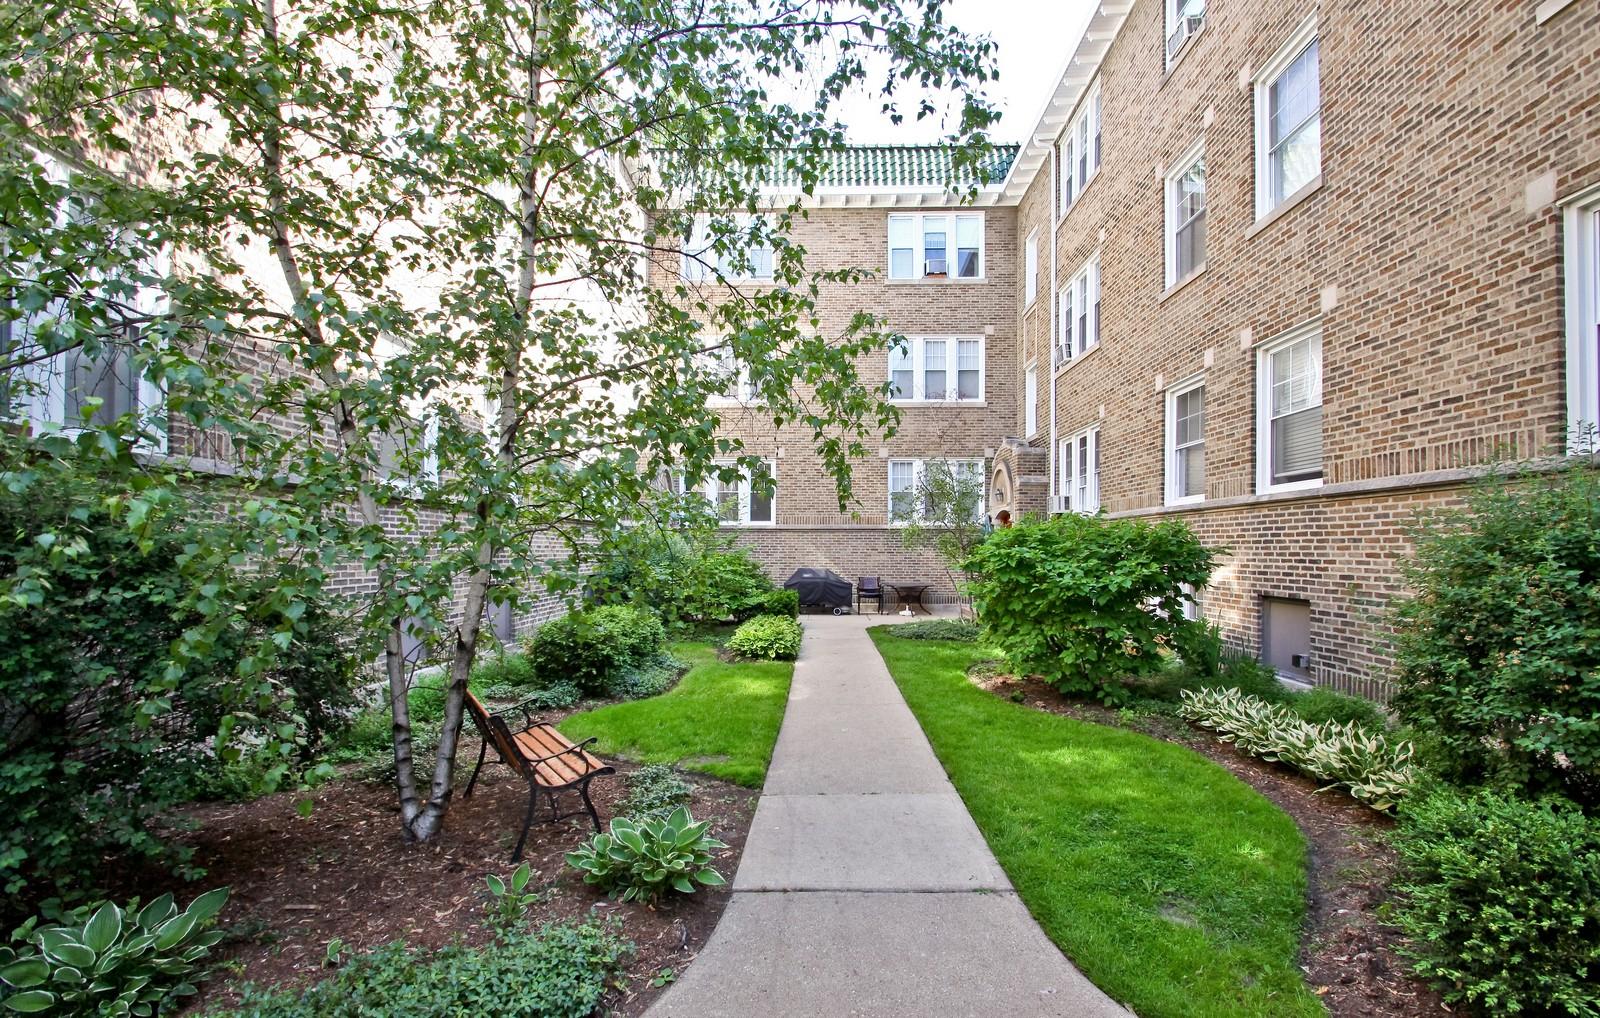 Real Estate Photography - 723 Reba Pl, Unit 3N, Evanston, IL, 60202 - Front View